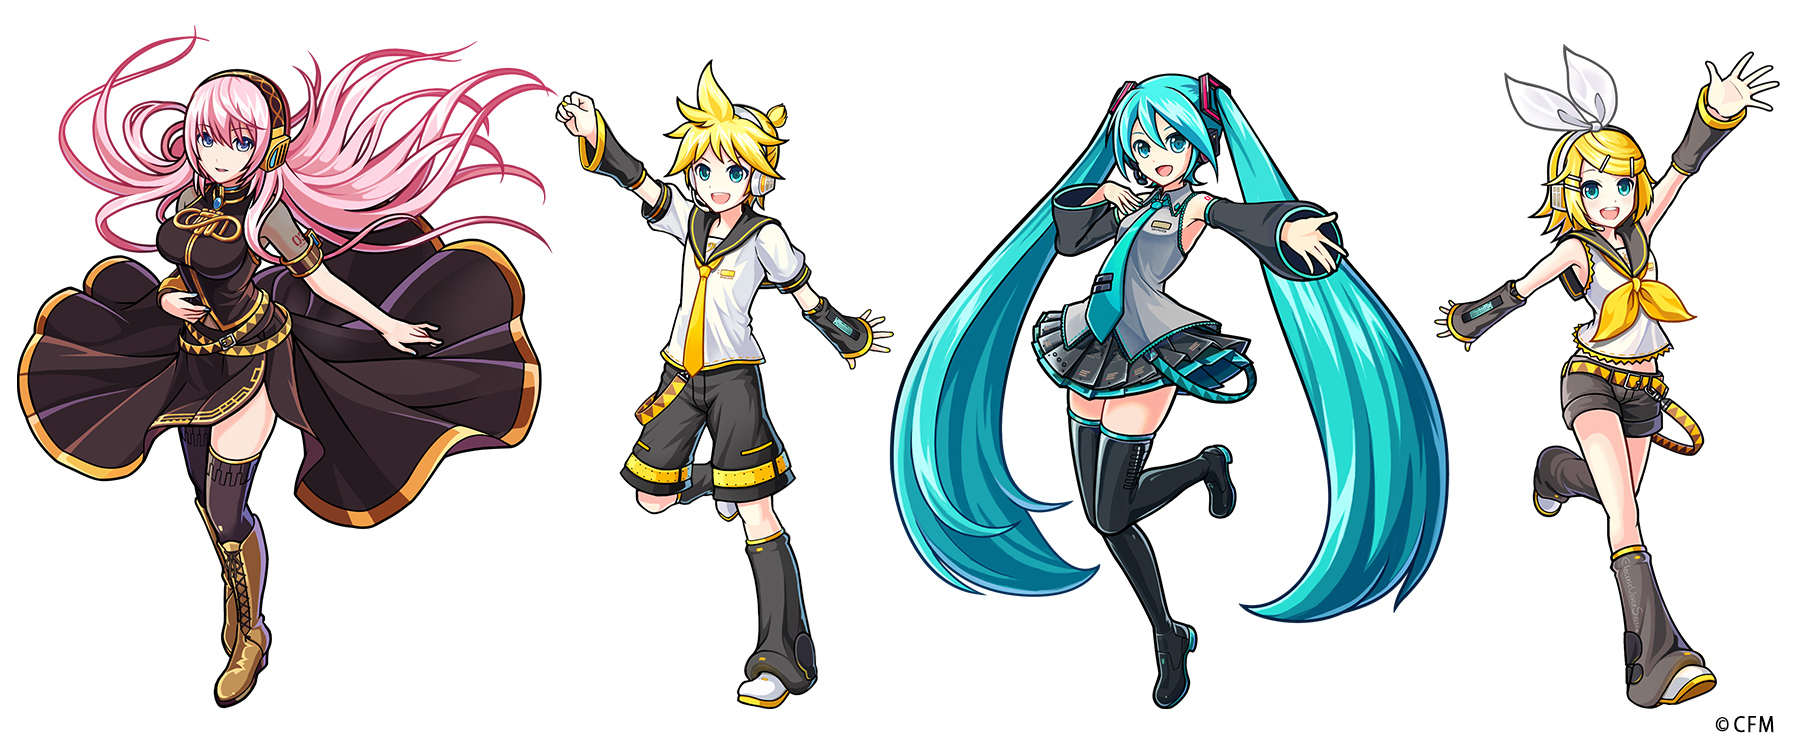 image - gear-megurine luka, kagamine len, hatsune miku, and kagamine